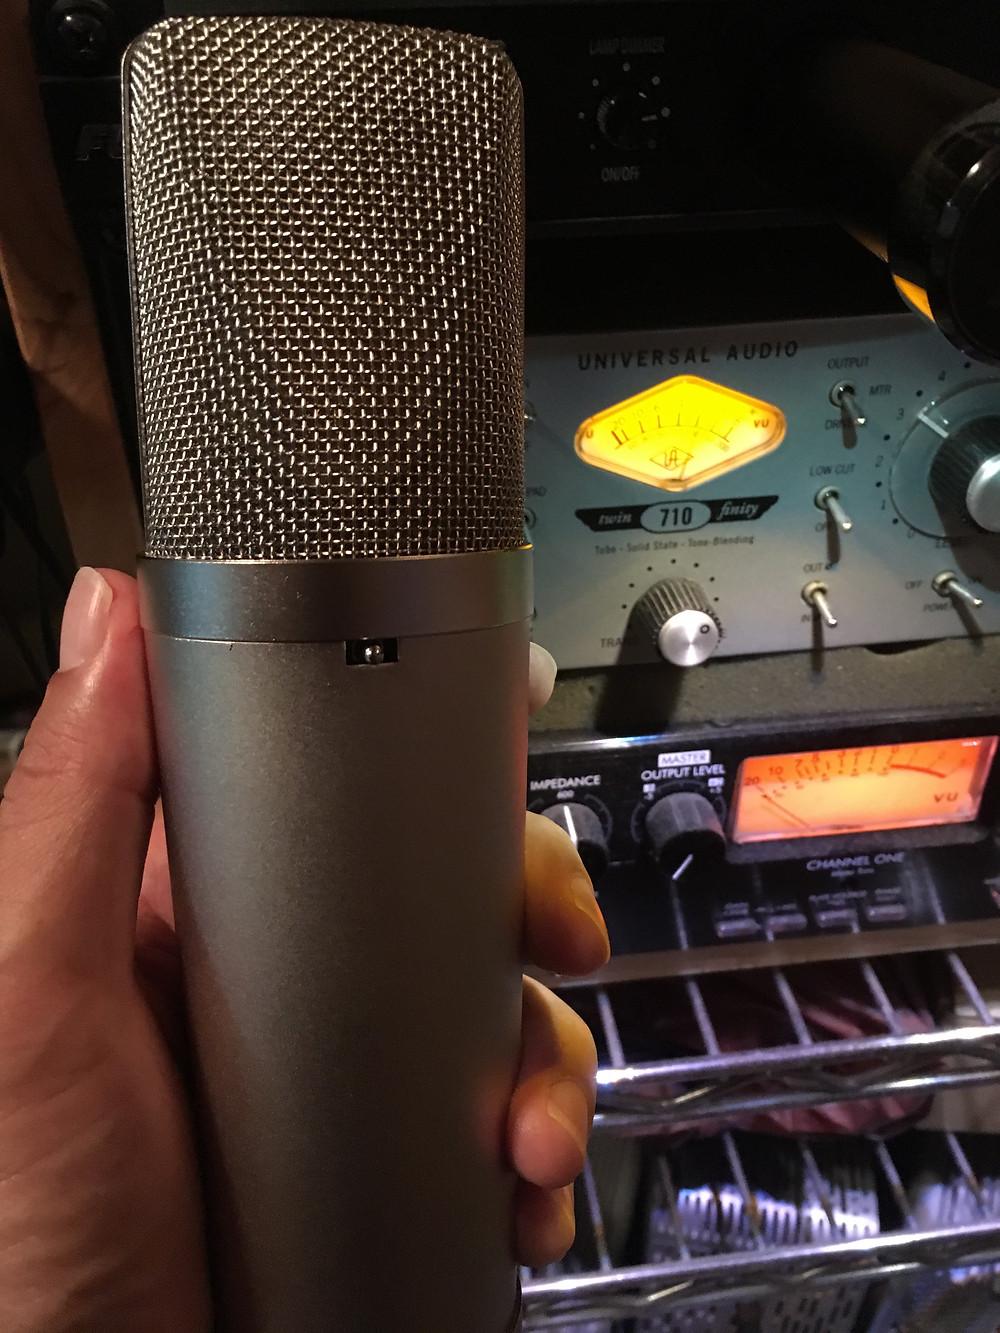 CE87 (U87 clone microphone by Clear Echo) hand made